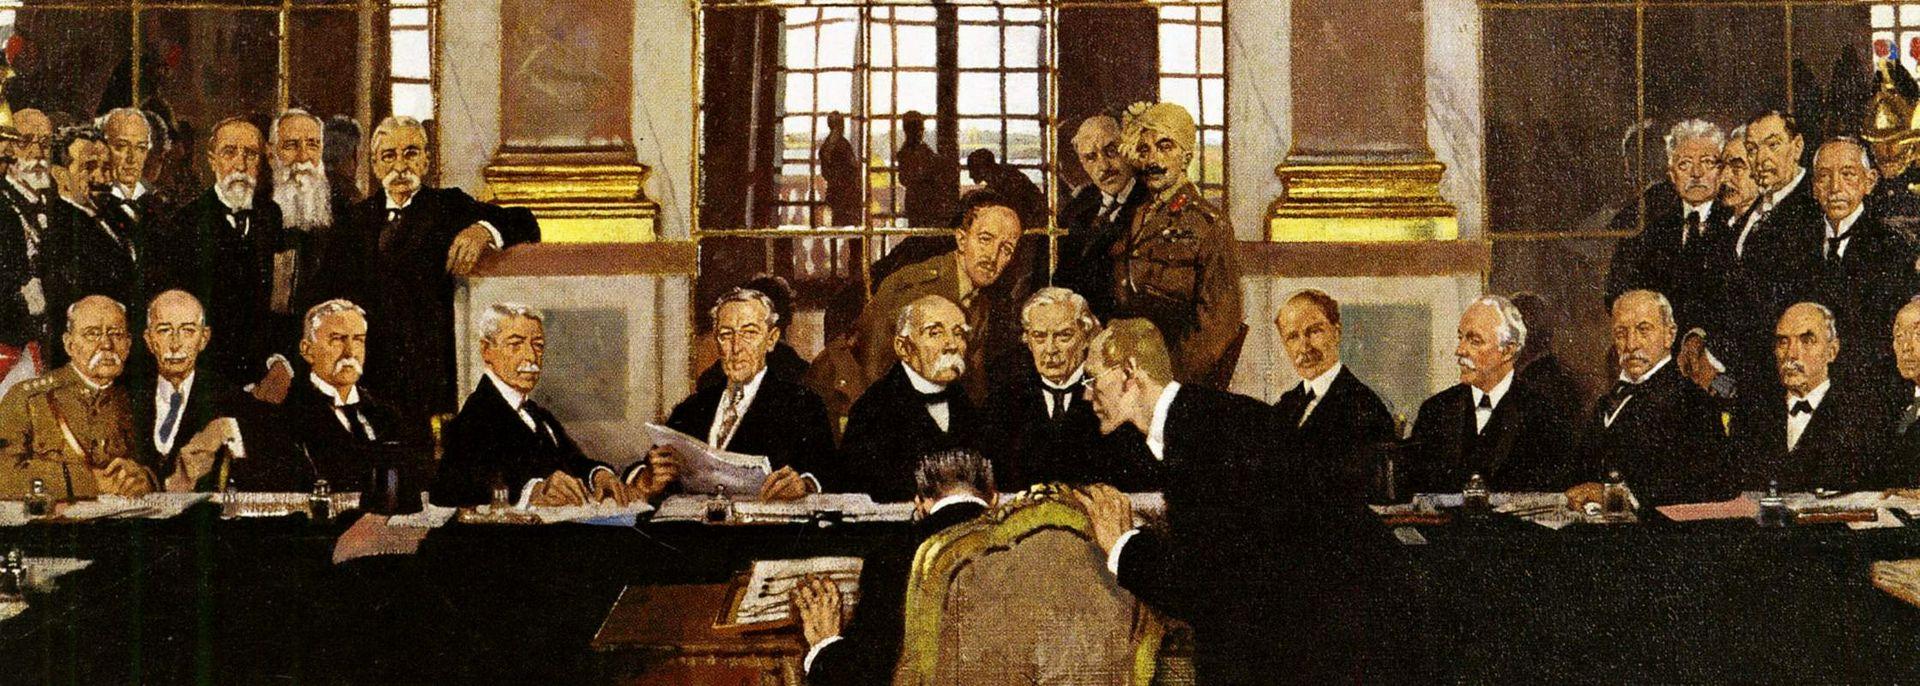 A versailles-i kastély tükörterme, 1919. június 28. Forrás: Imperial War Museum, Art.IWM ART 2856